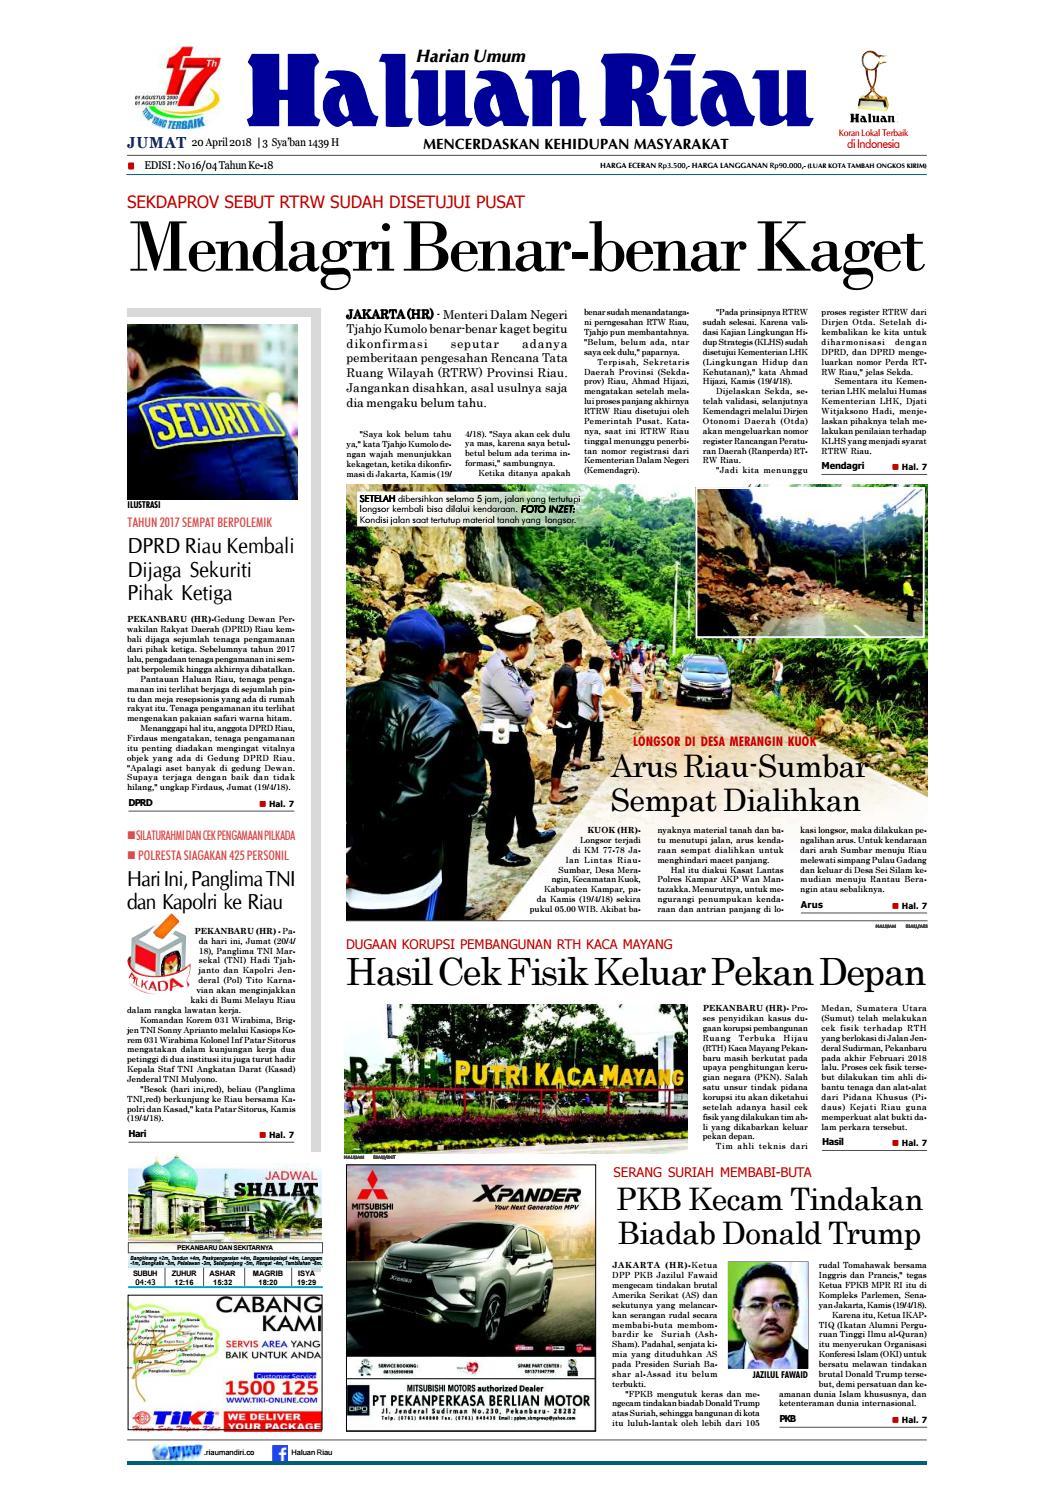 Haluanriau 20 20 20,pdf by Haluan Riau   issuu